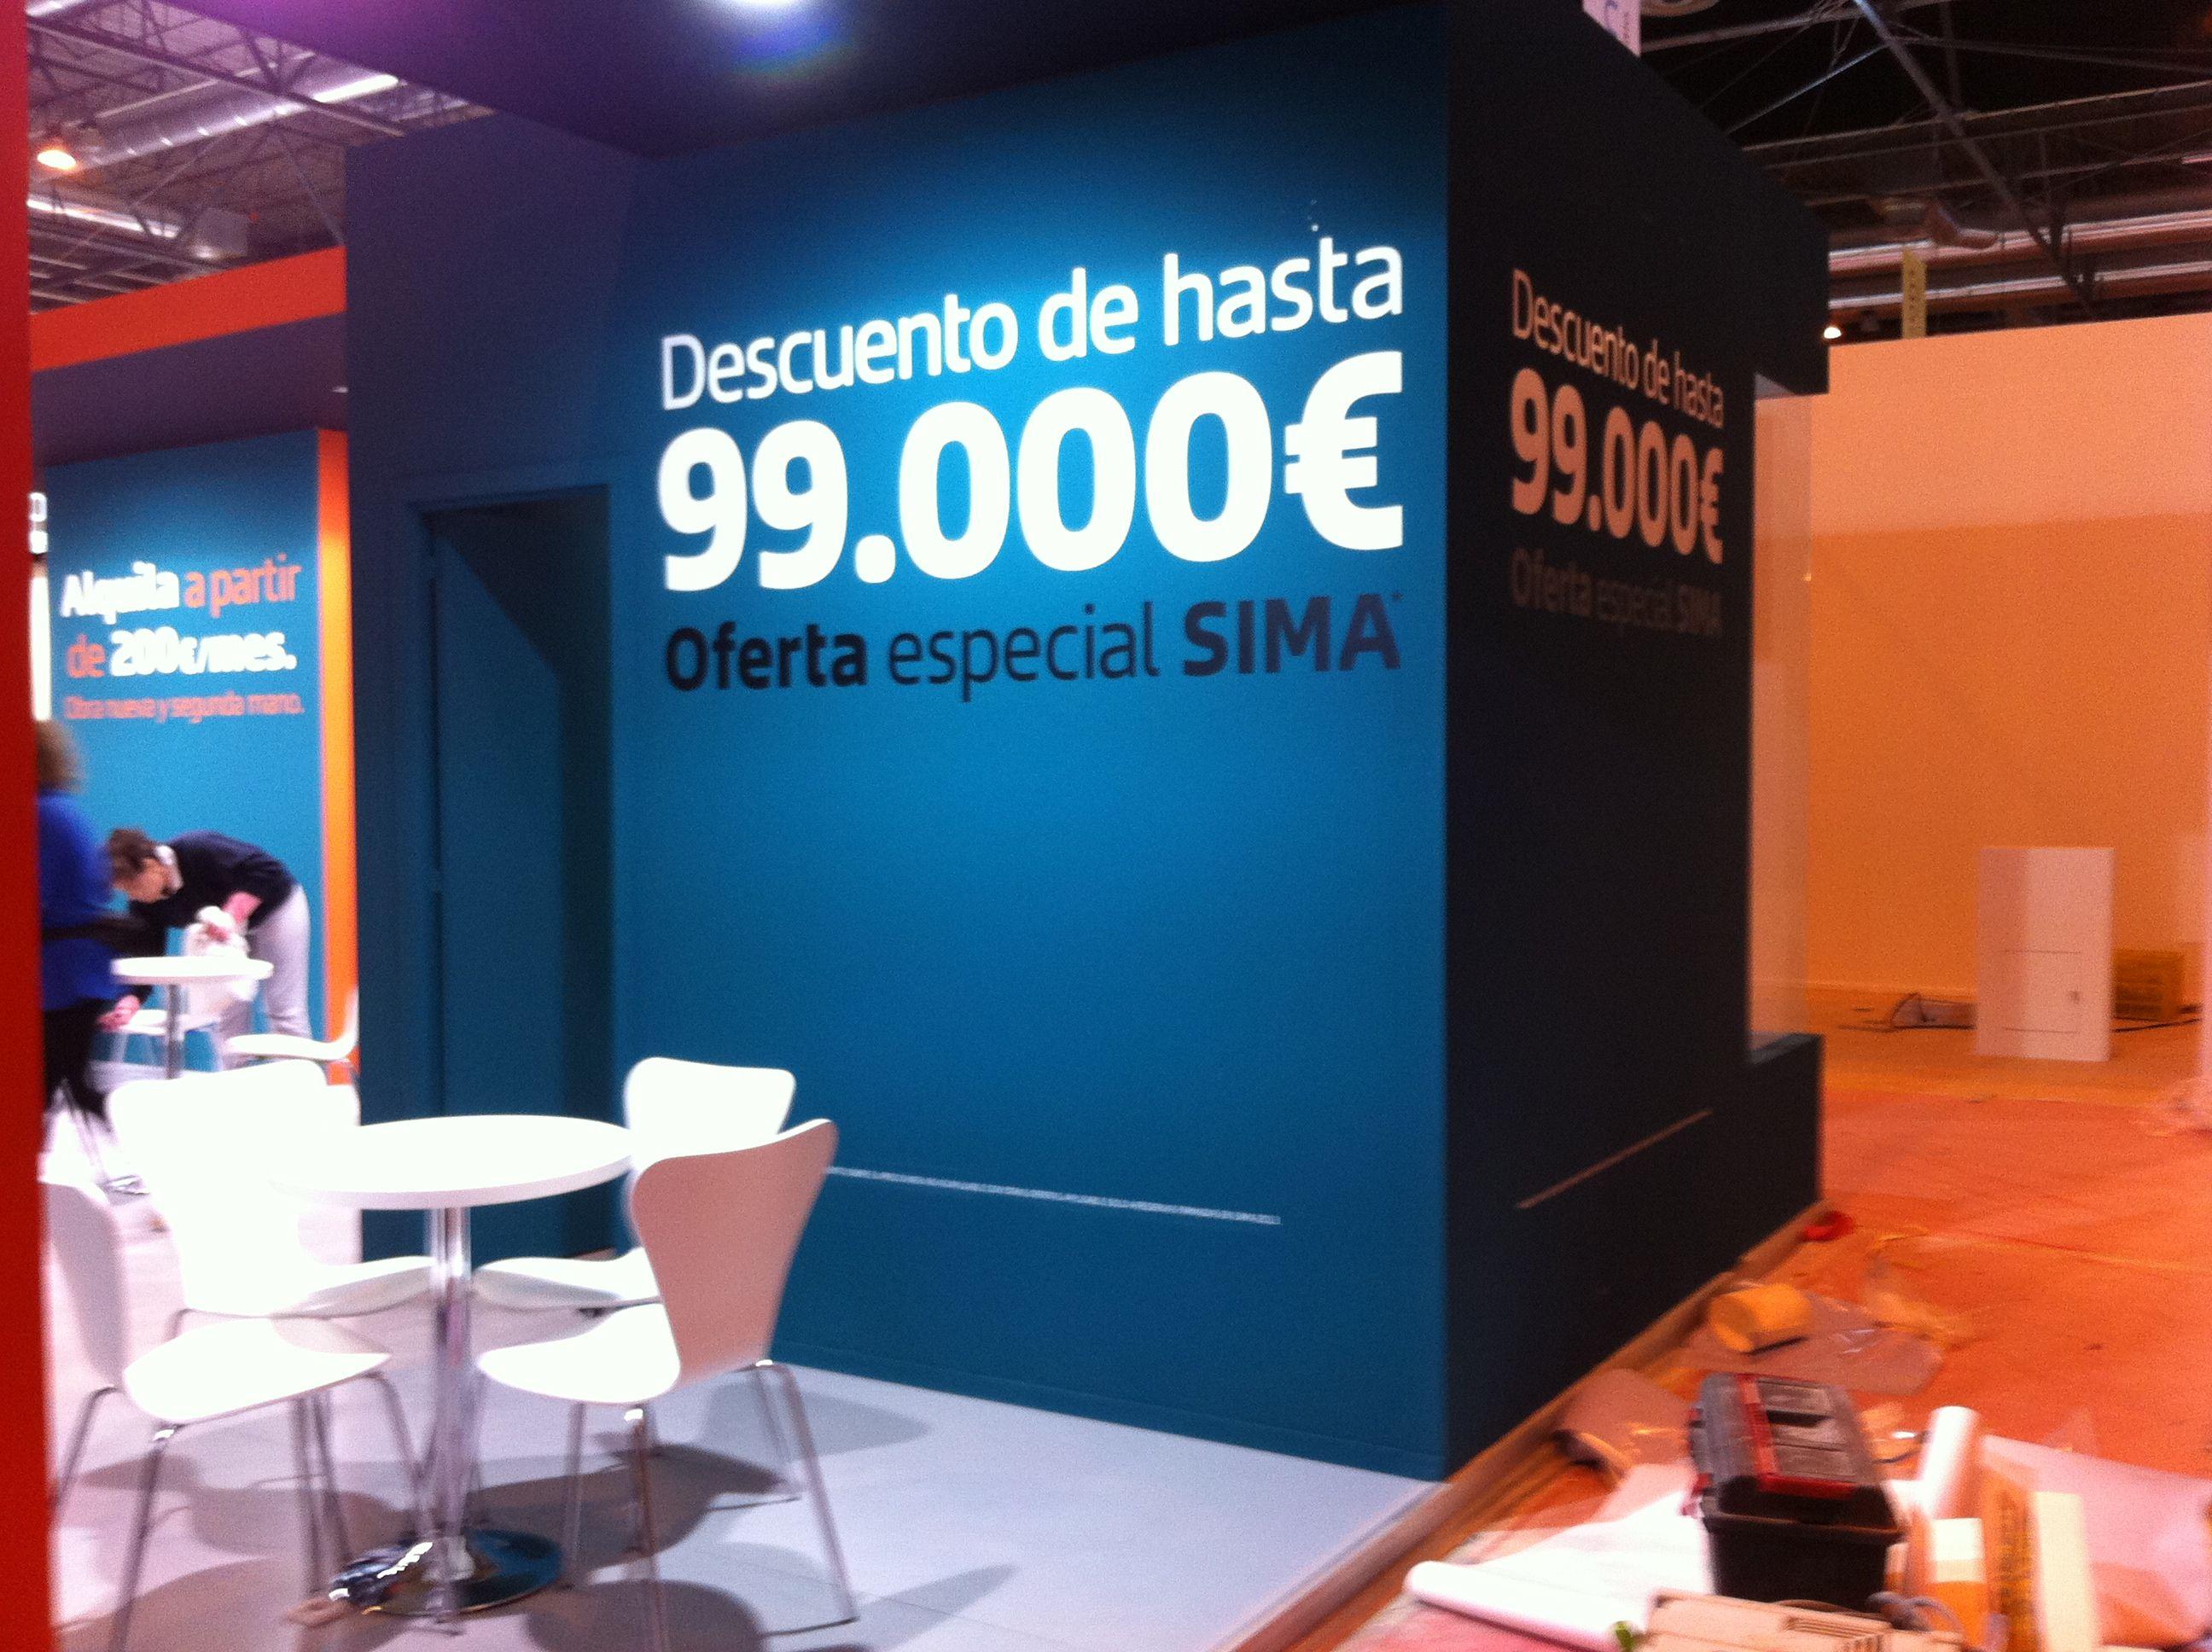 Stand caixa catalunya sima madrid ifema for Caixa catalunya oficinas en madrid